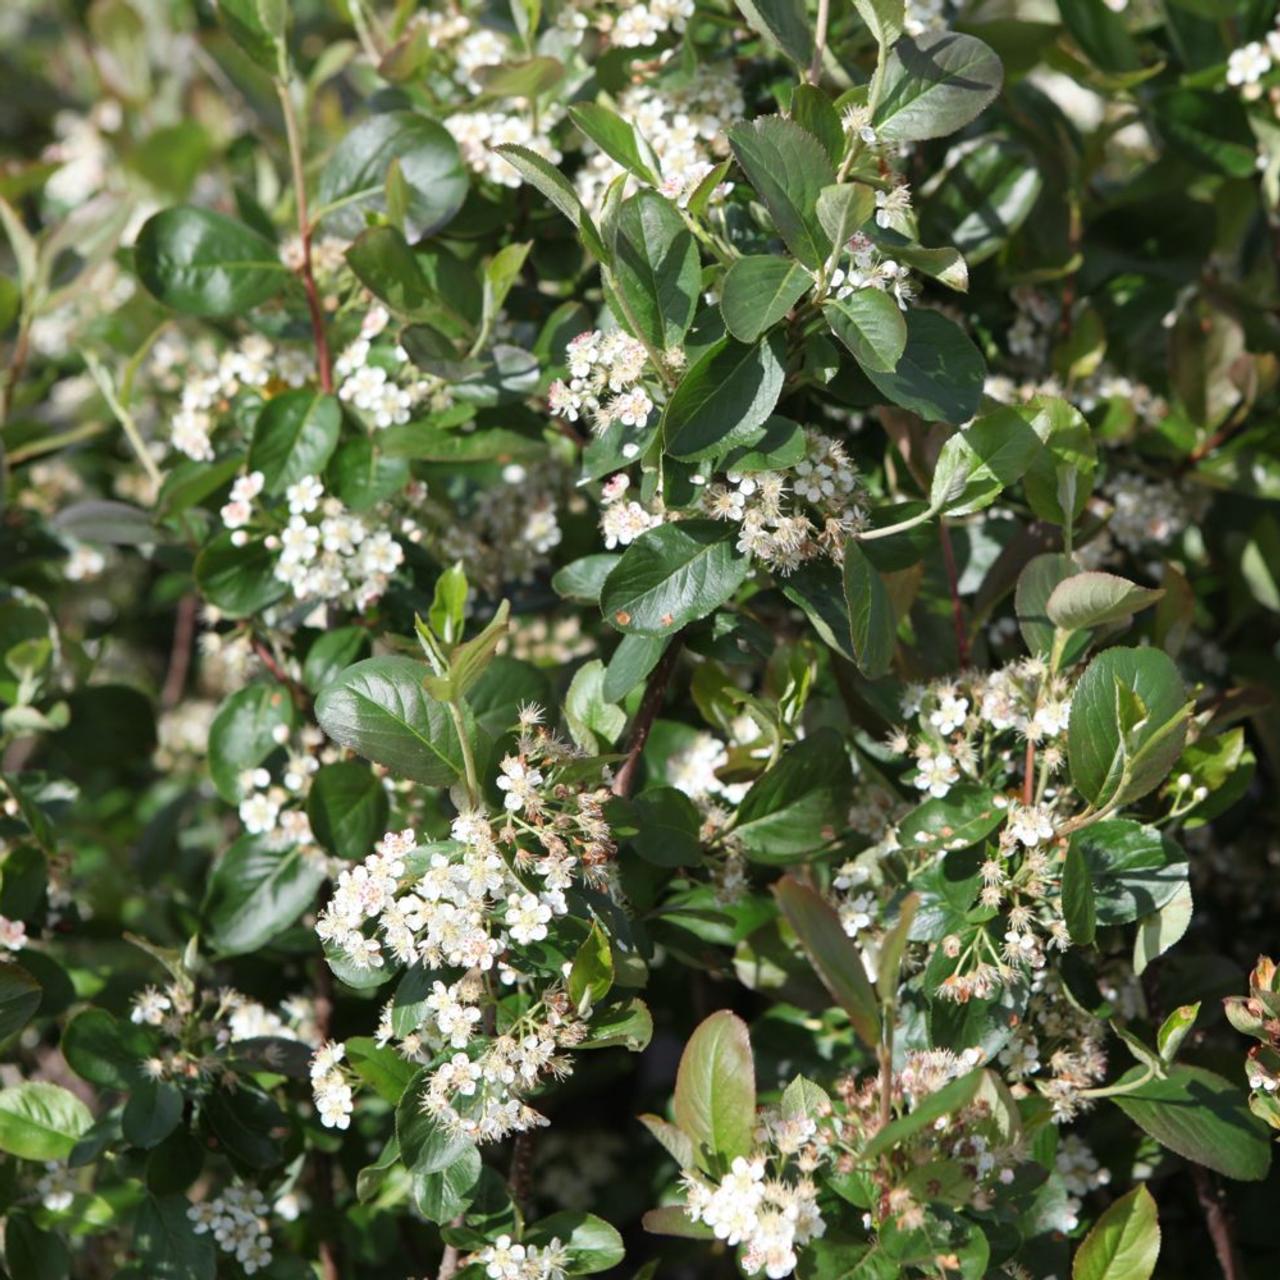 Aronia x prunifolia 'Viking' plant